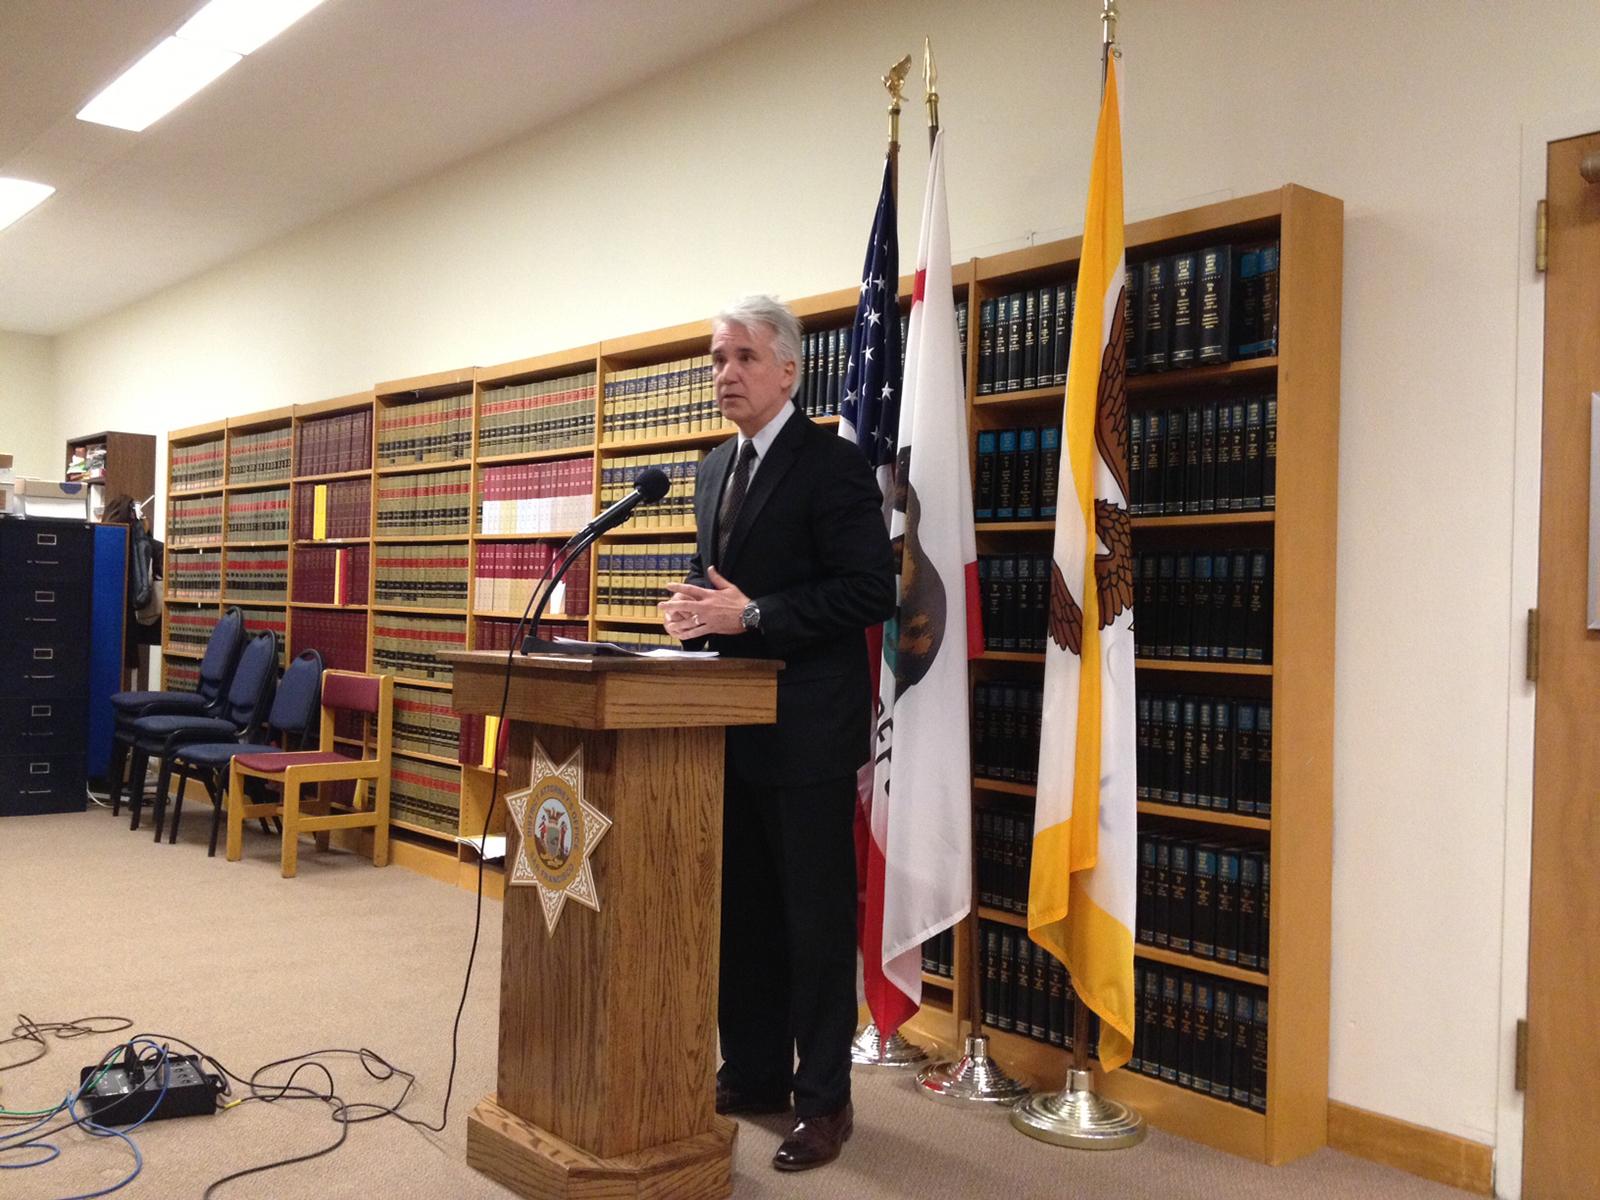 Bail for Collision Suspect Set at $10 Million